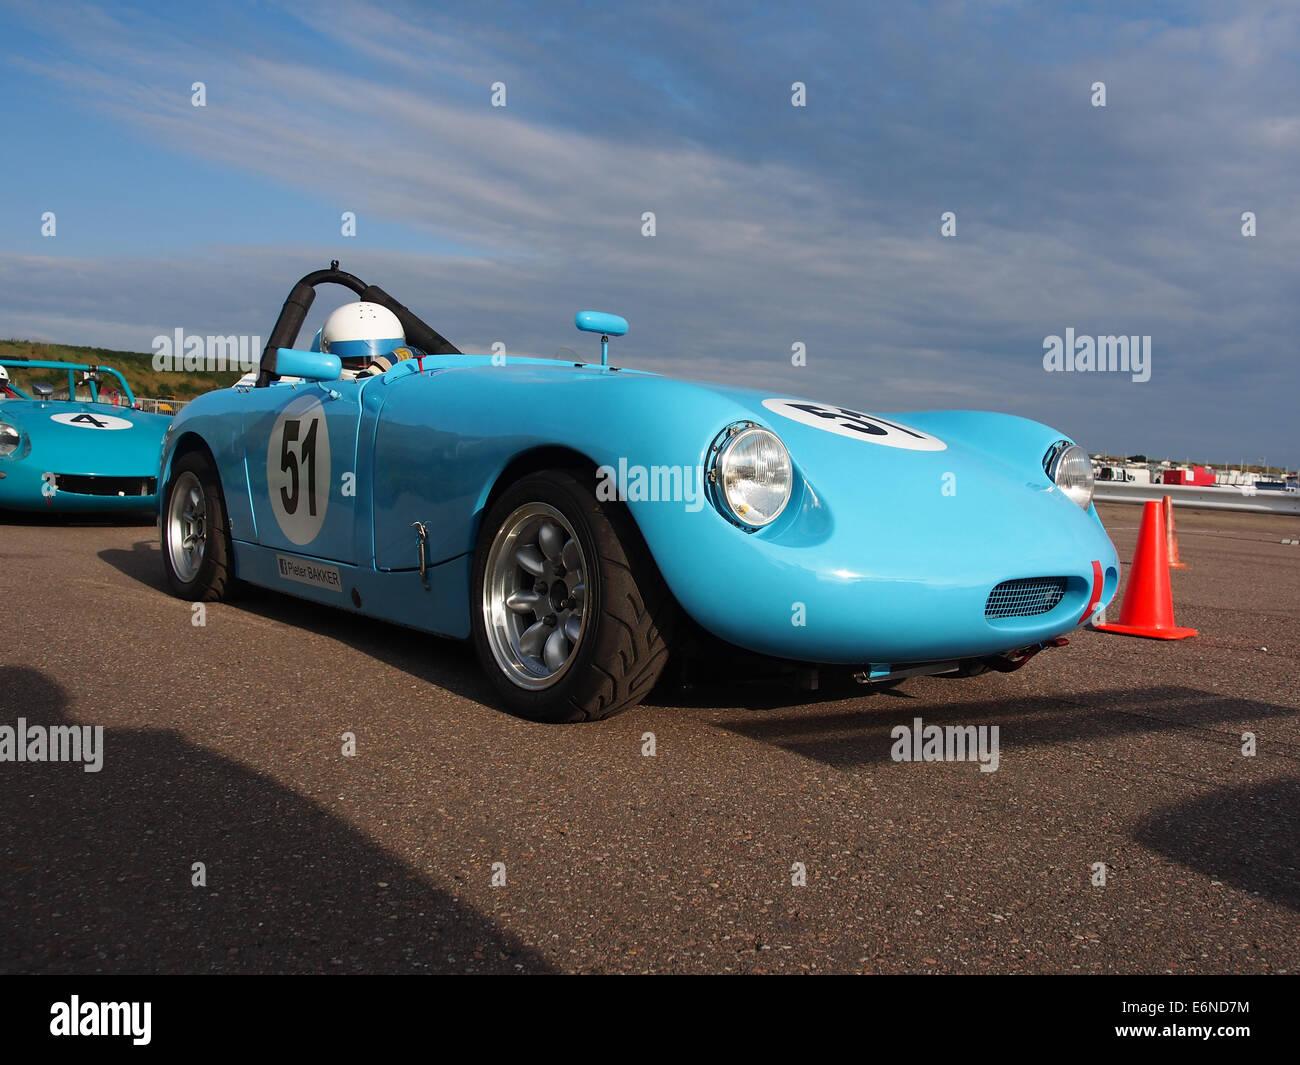 Austin Healey Sprite Monza - No52, Pieter Bakker in Zandvoort, pic5 Stockbild